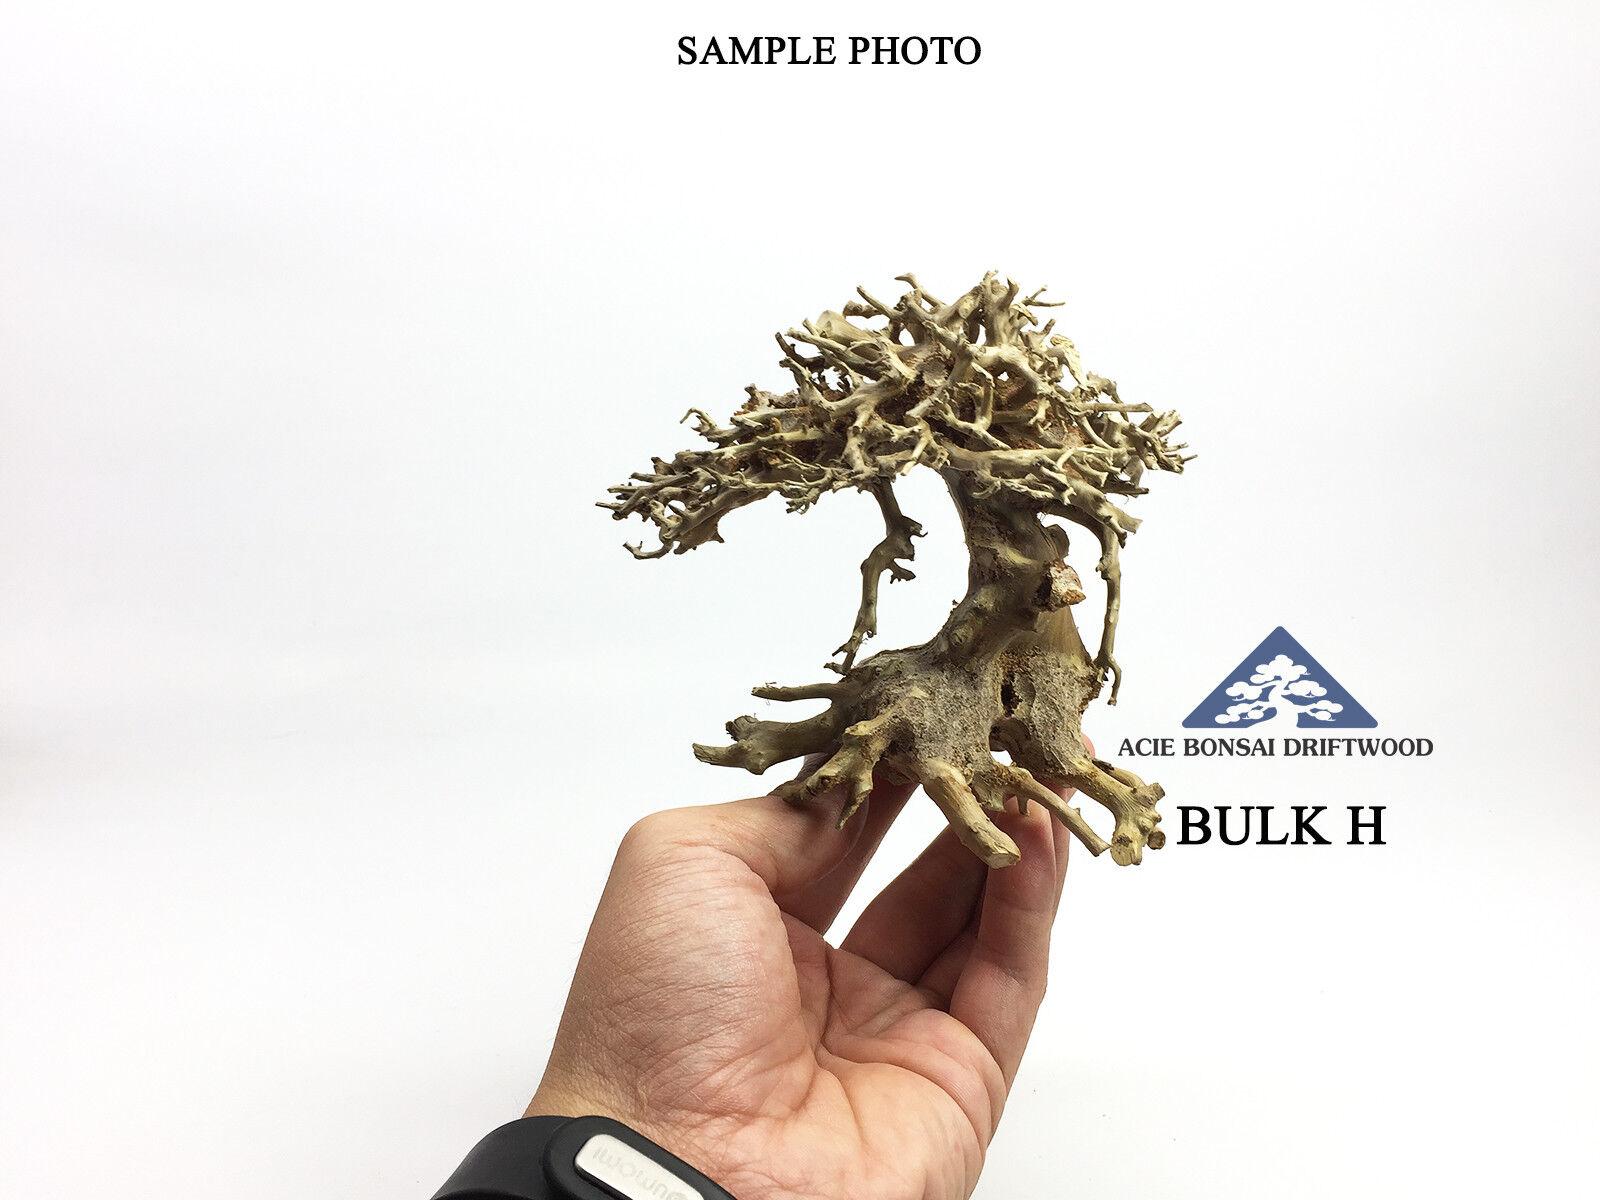 Aquarium Bonsai Driftwood Moss Tree Nano Fish Shrimp   Make To Order   - Bulk H